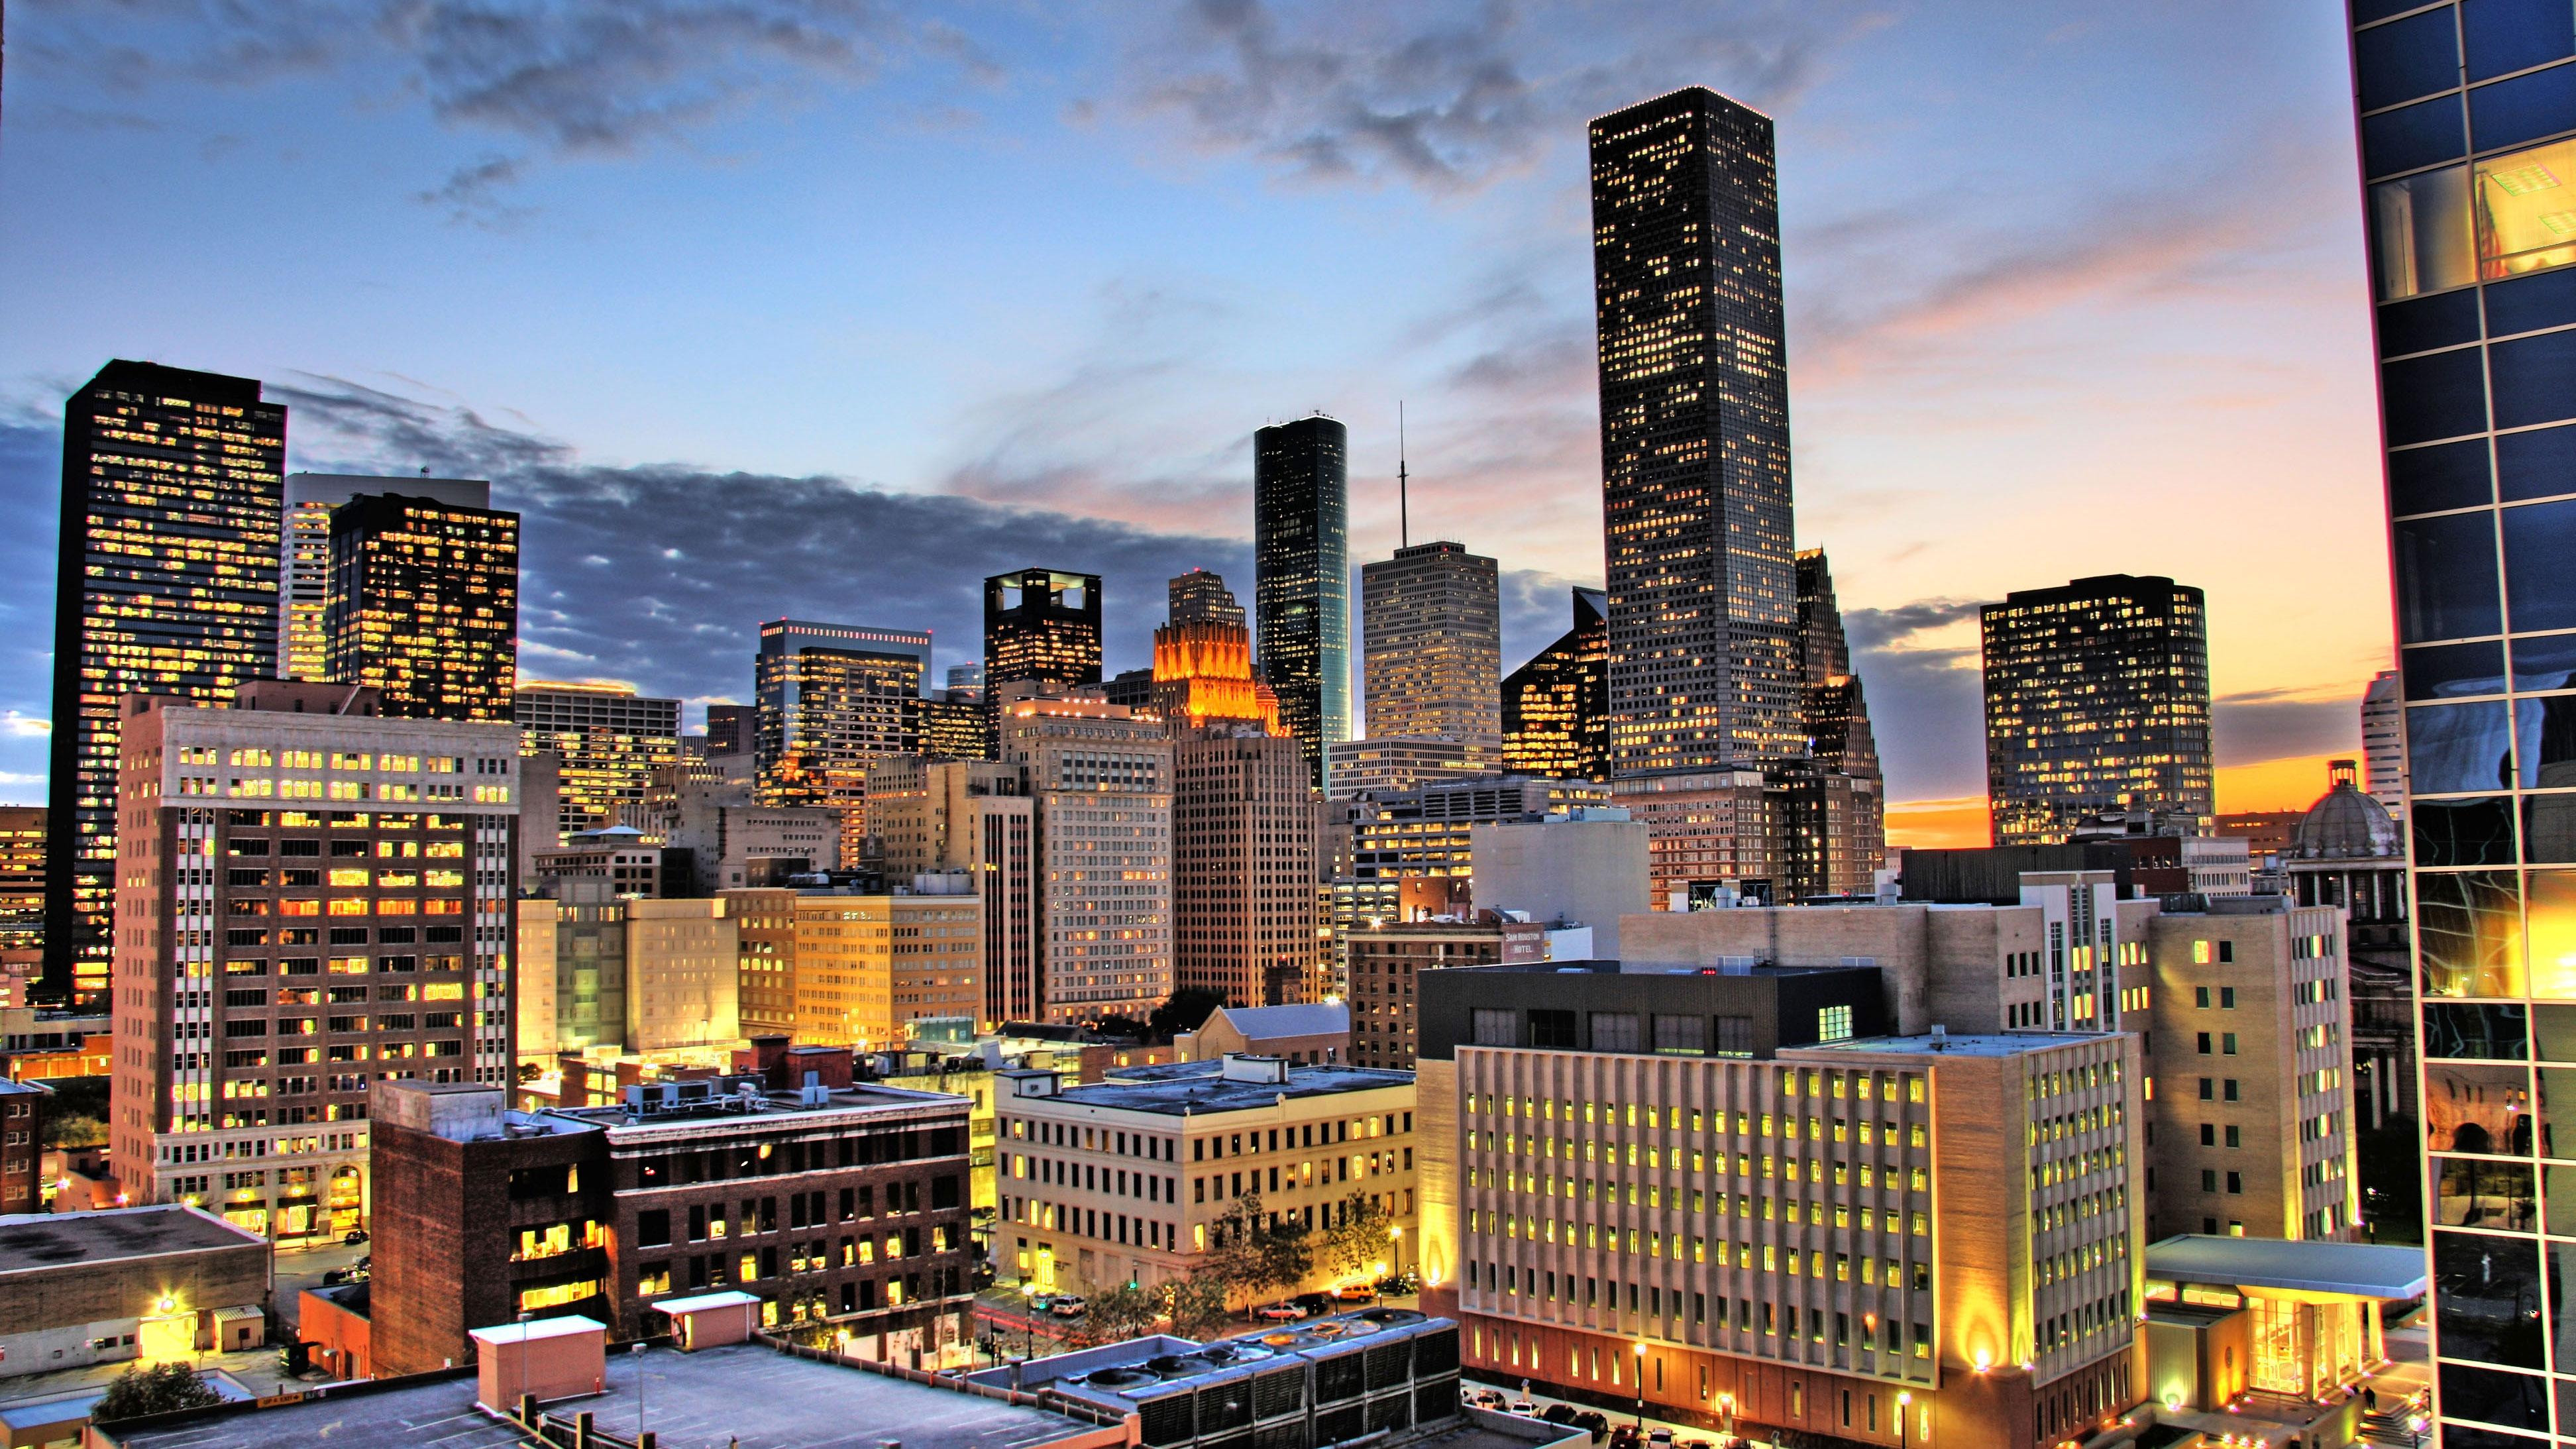 January 27-29, 2020, Simulating with Aimsun Next, Houston, TX